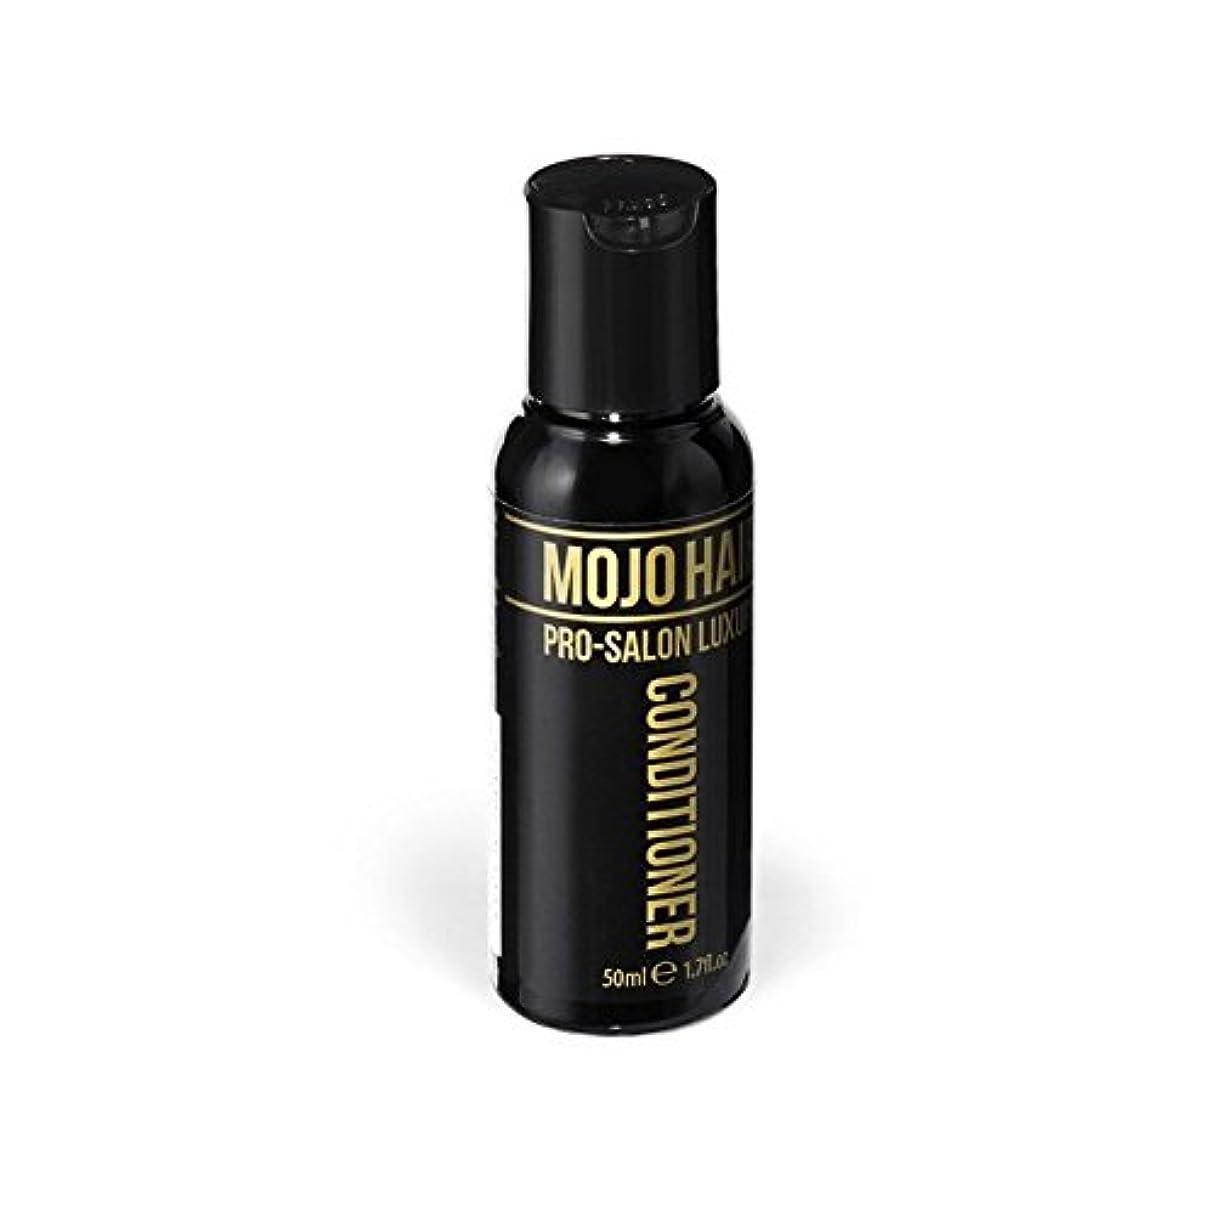 Mojo Hair Pro-Salon Luxury Conditioner (50ml) - モジョの毛プロのサロンの贅沢なコンディショナー(50ミリリットル) [並行輸入品]